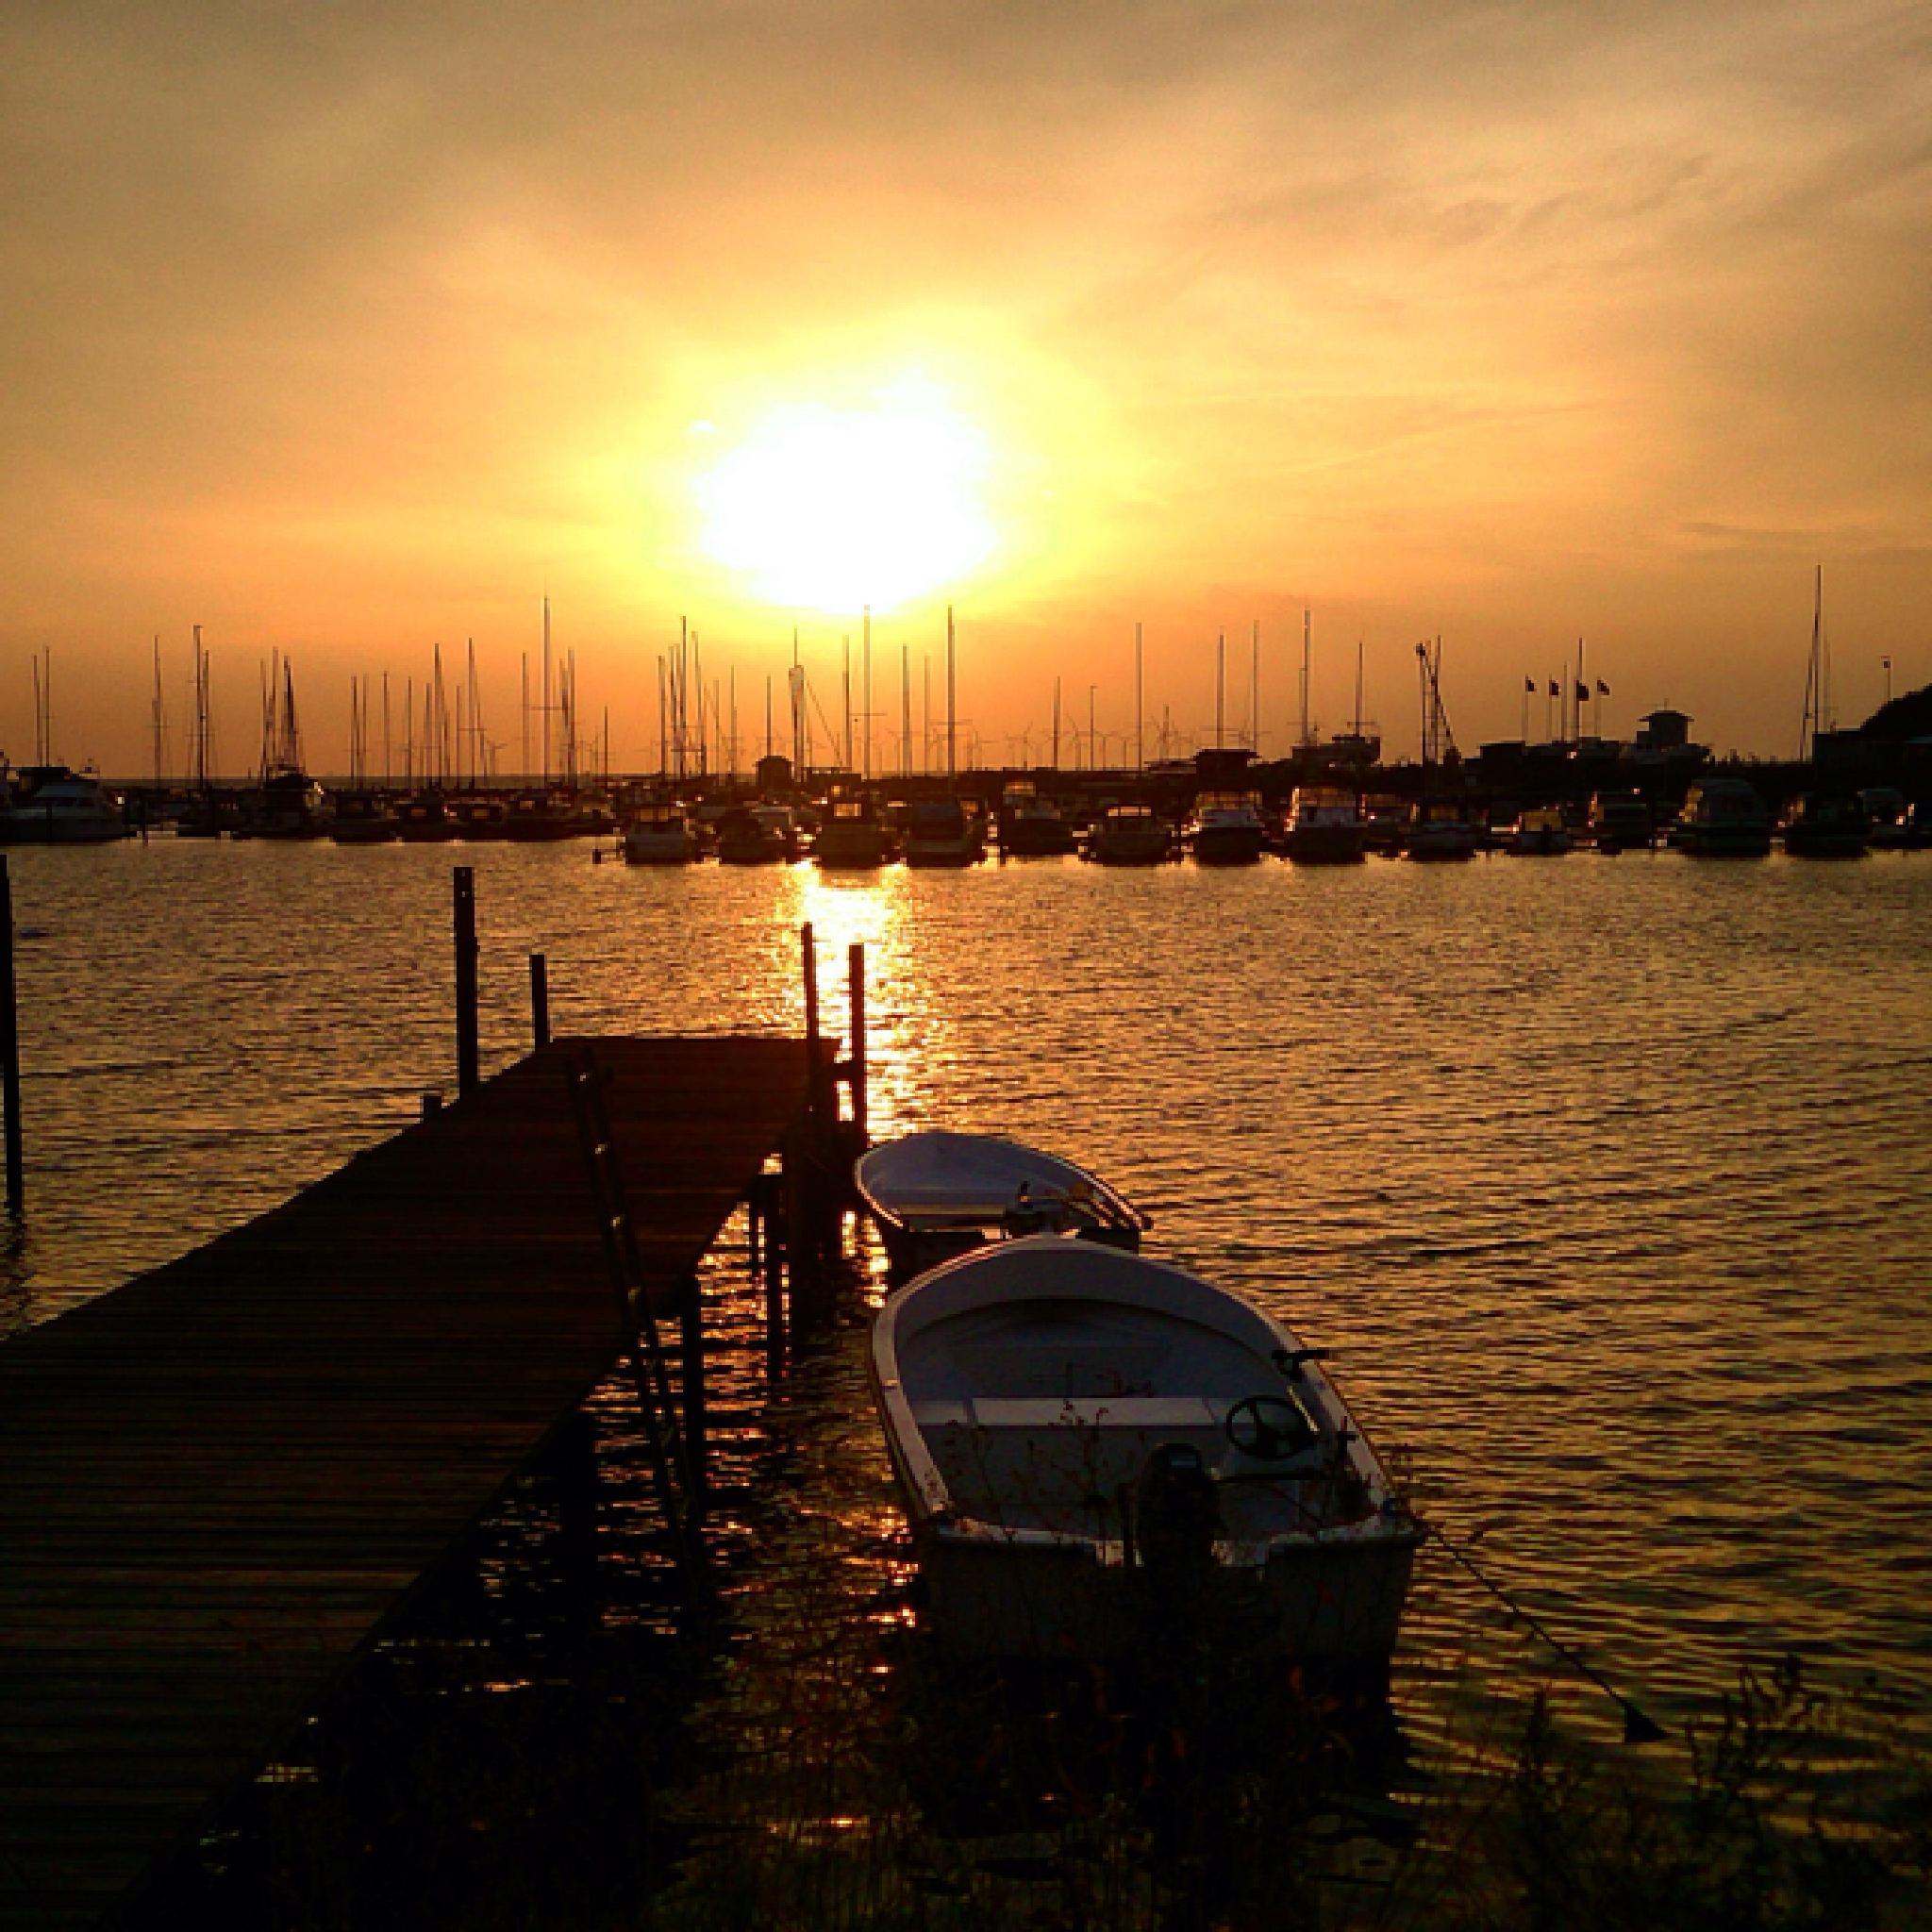 one more sunset photo from the Marina in Klagshamn Sweden by Lisa von Steijern